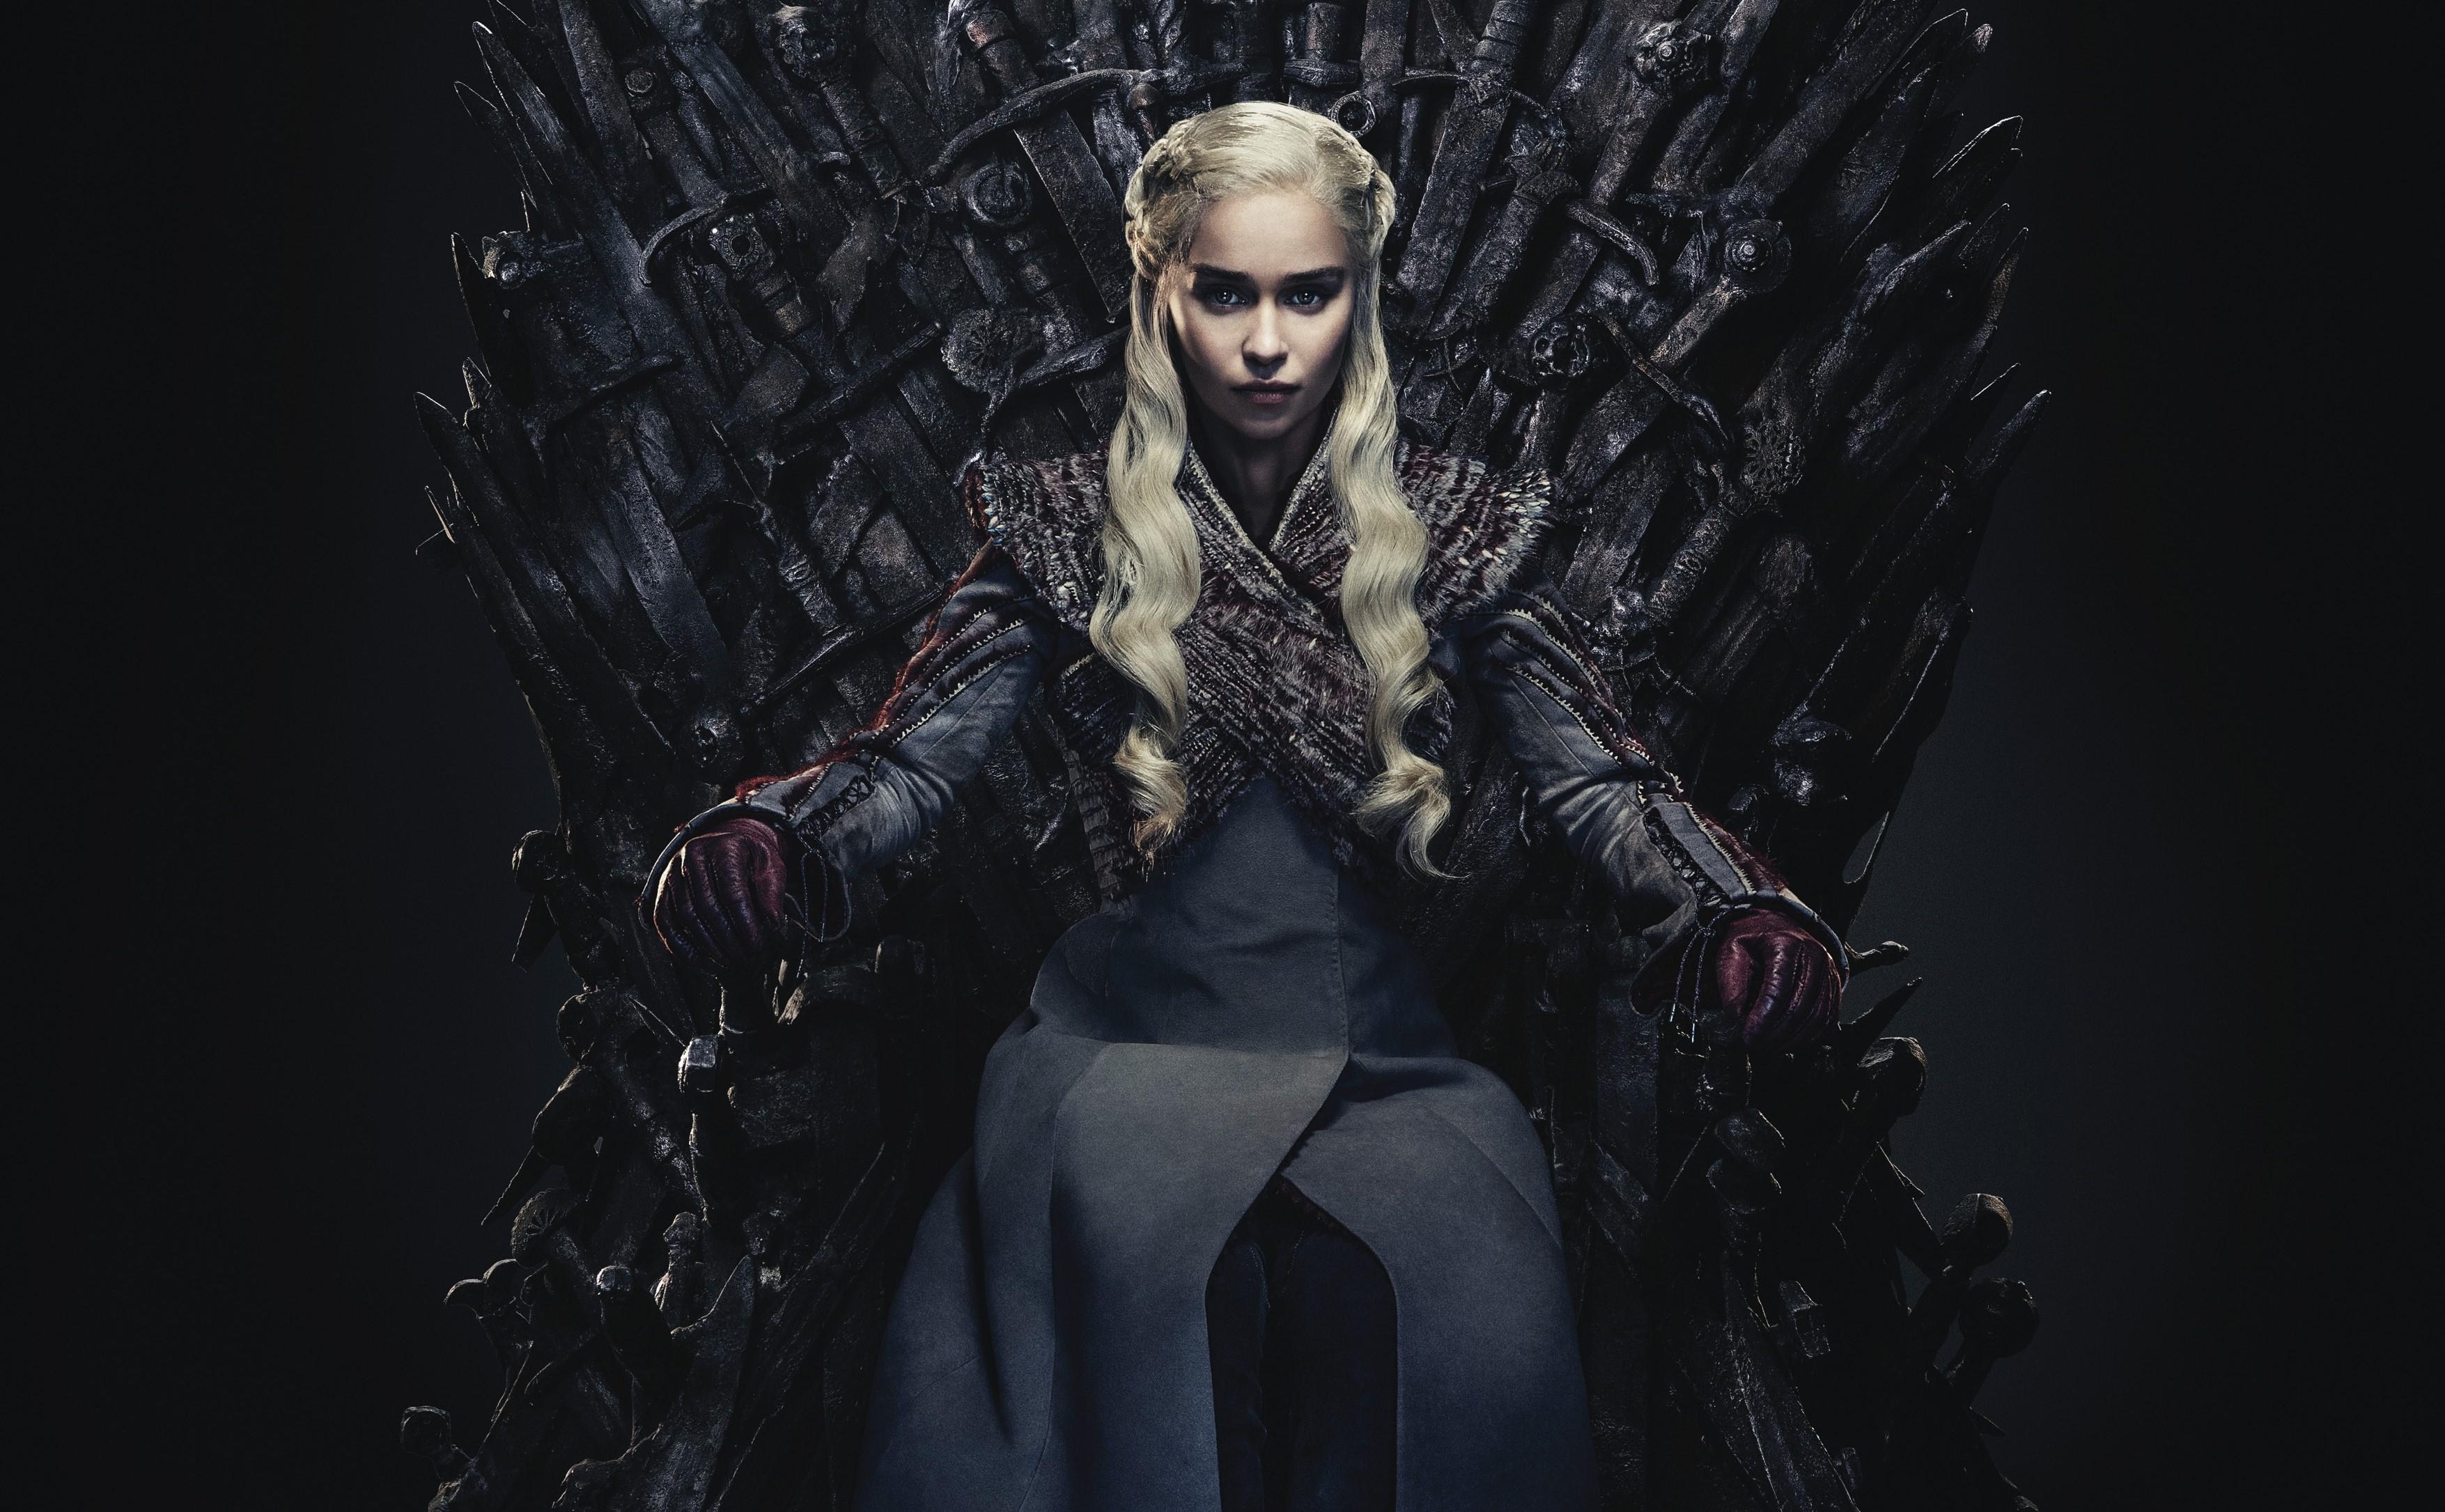 Wallpaper : Daenerys Targaryen, Emilia Clarke, Game of ...